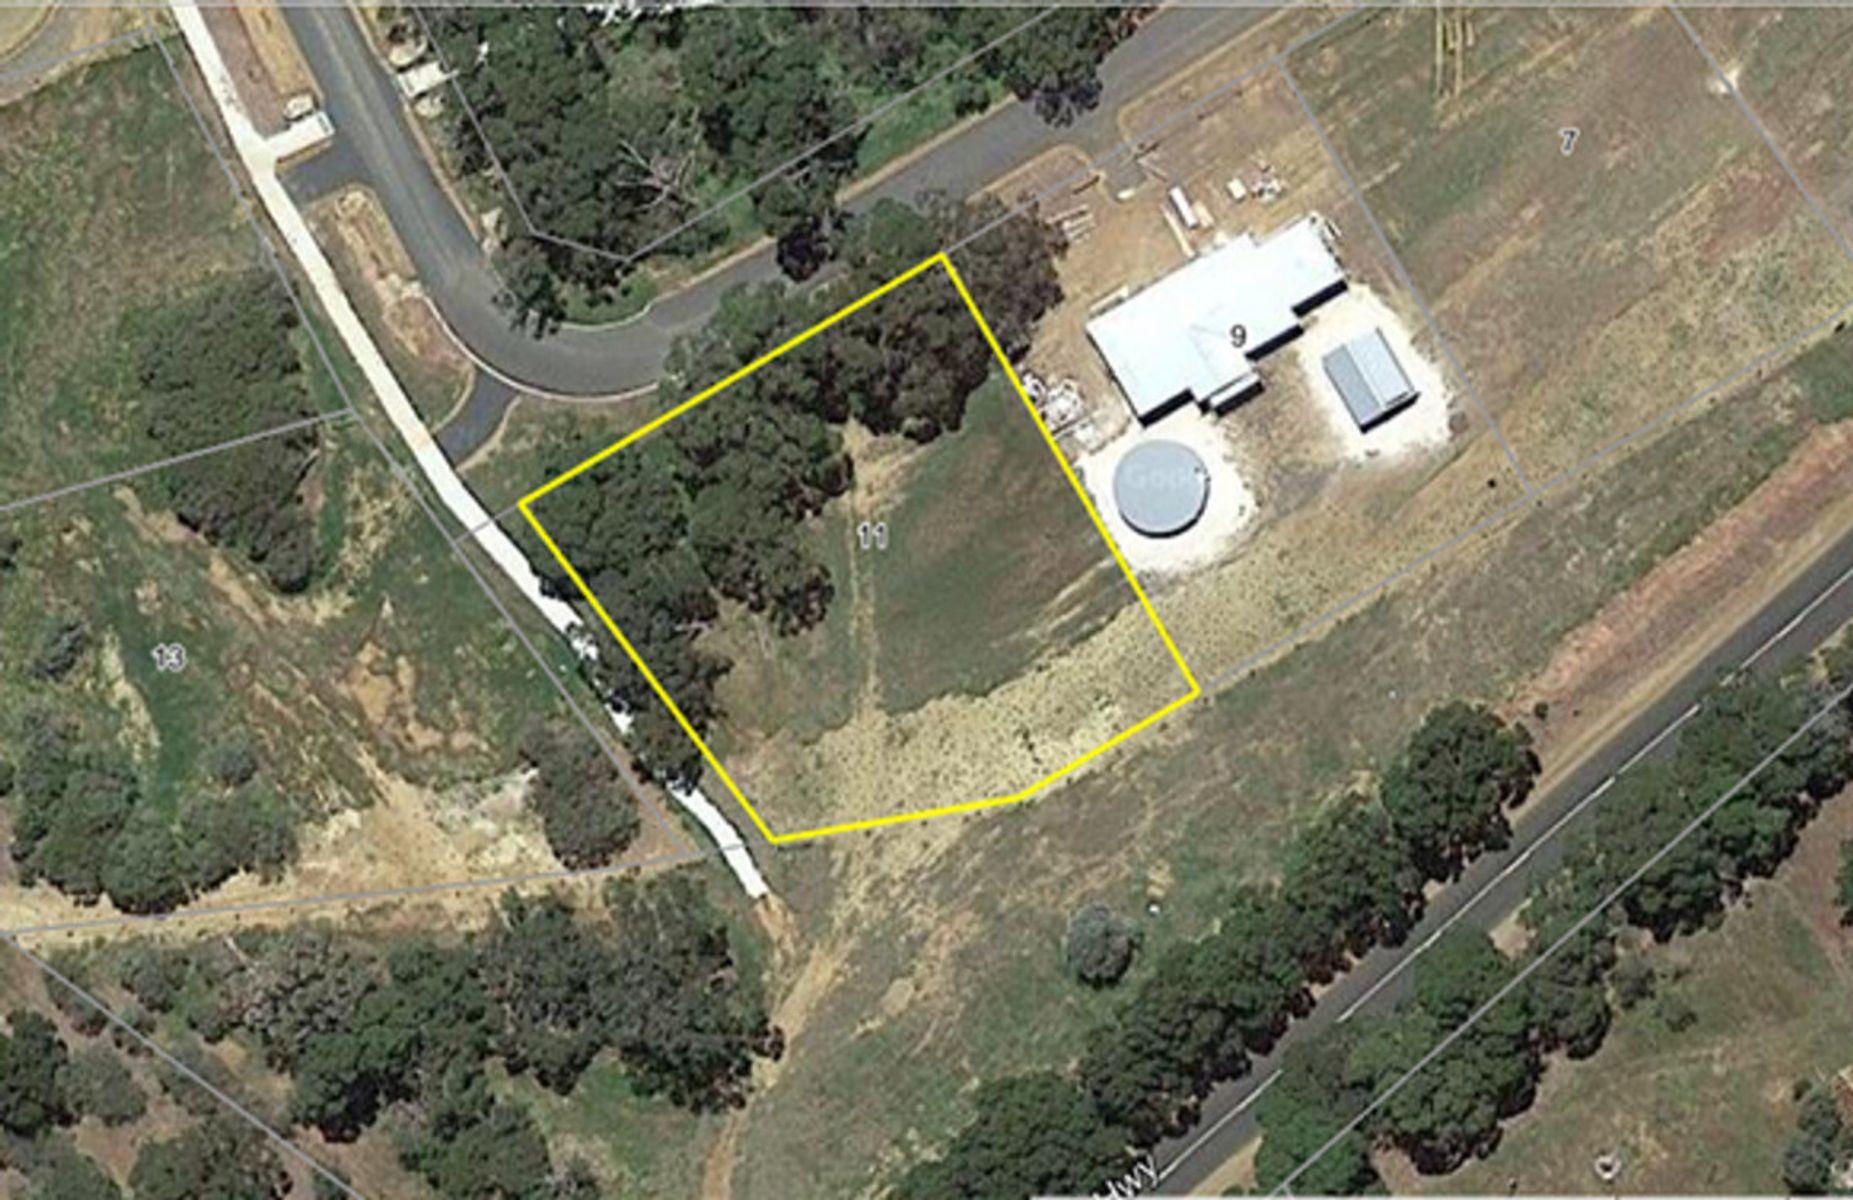 Lot 226/11 Lumber Crescent, Karridale, WA 6288